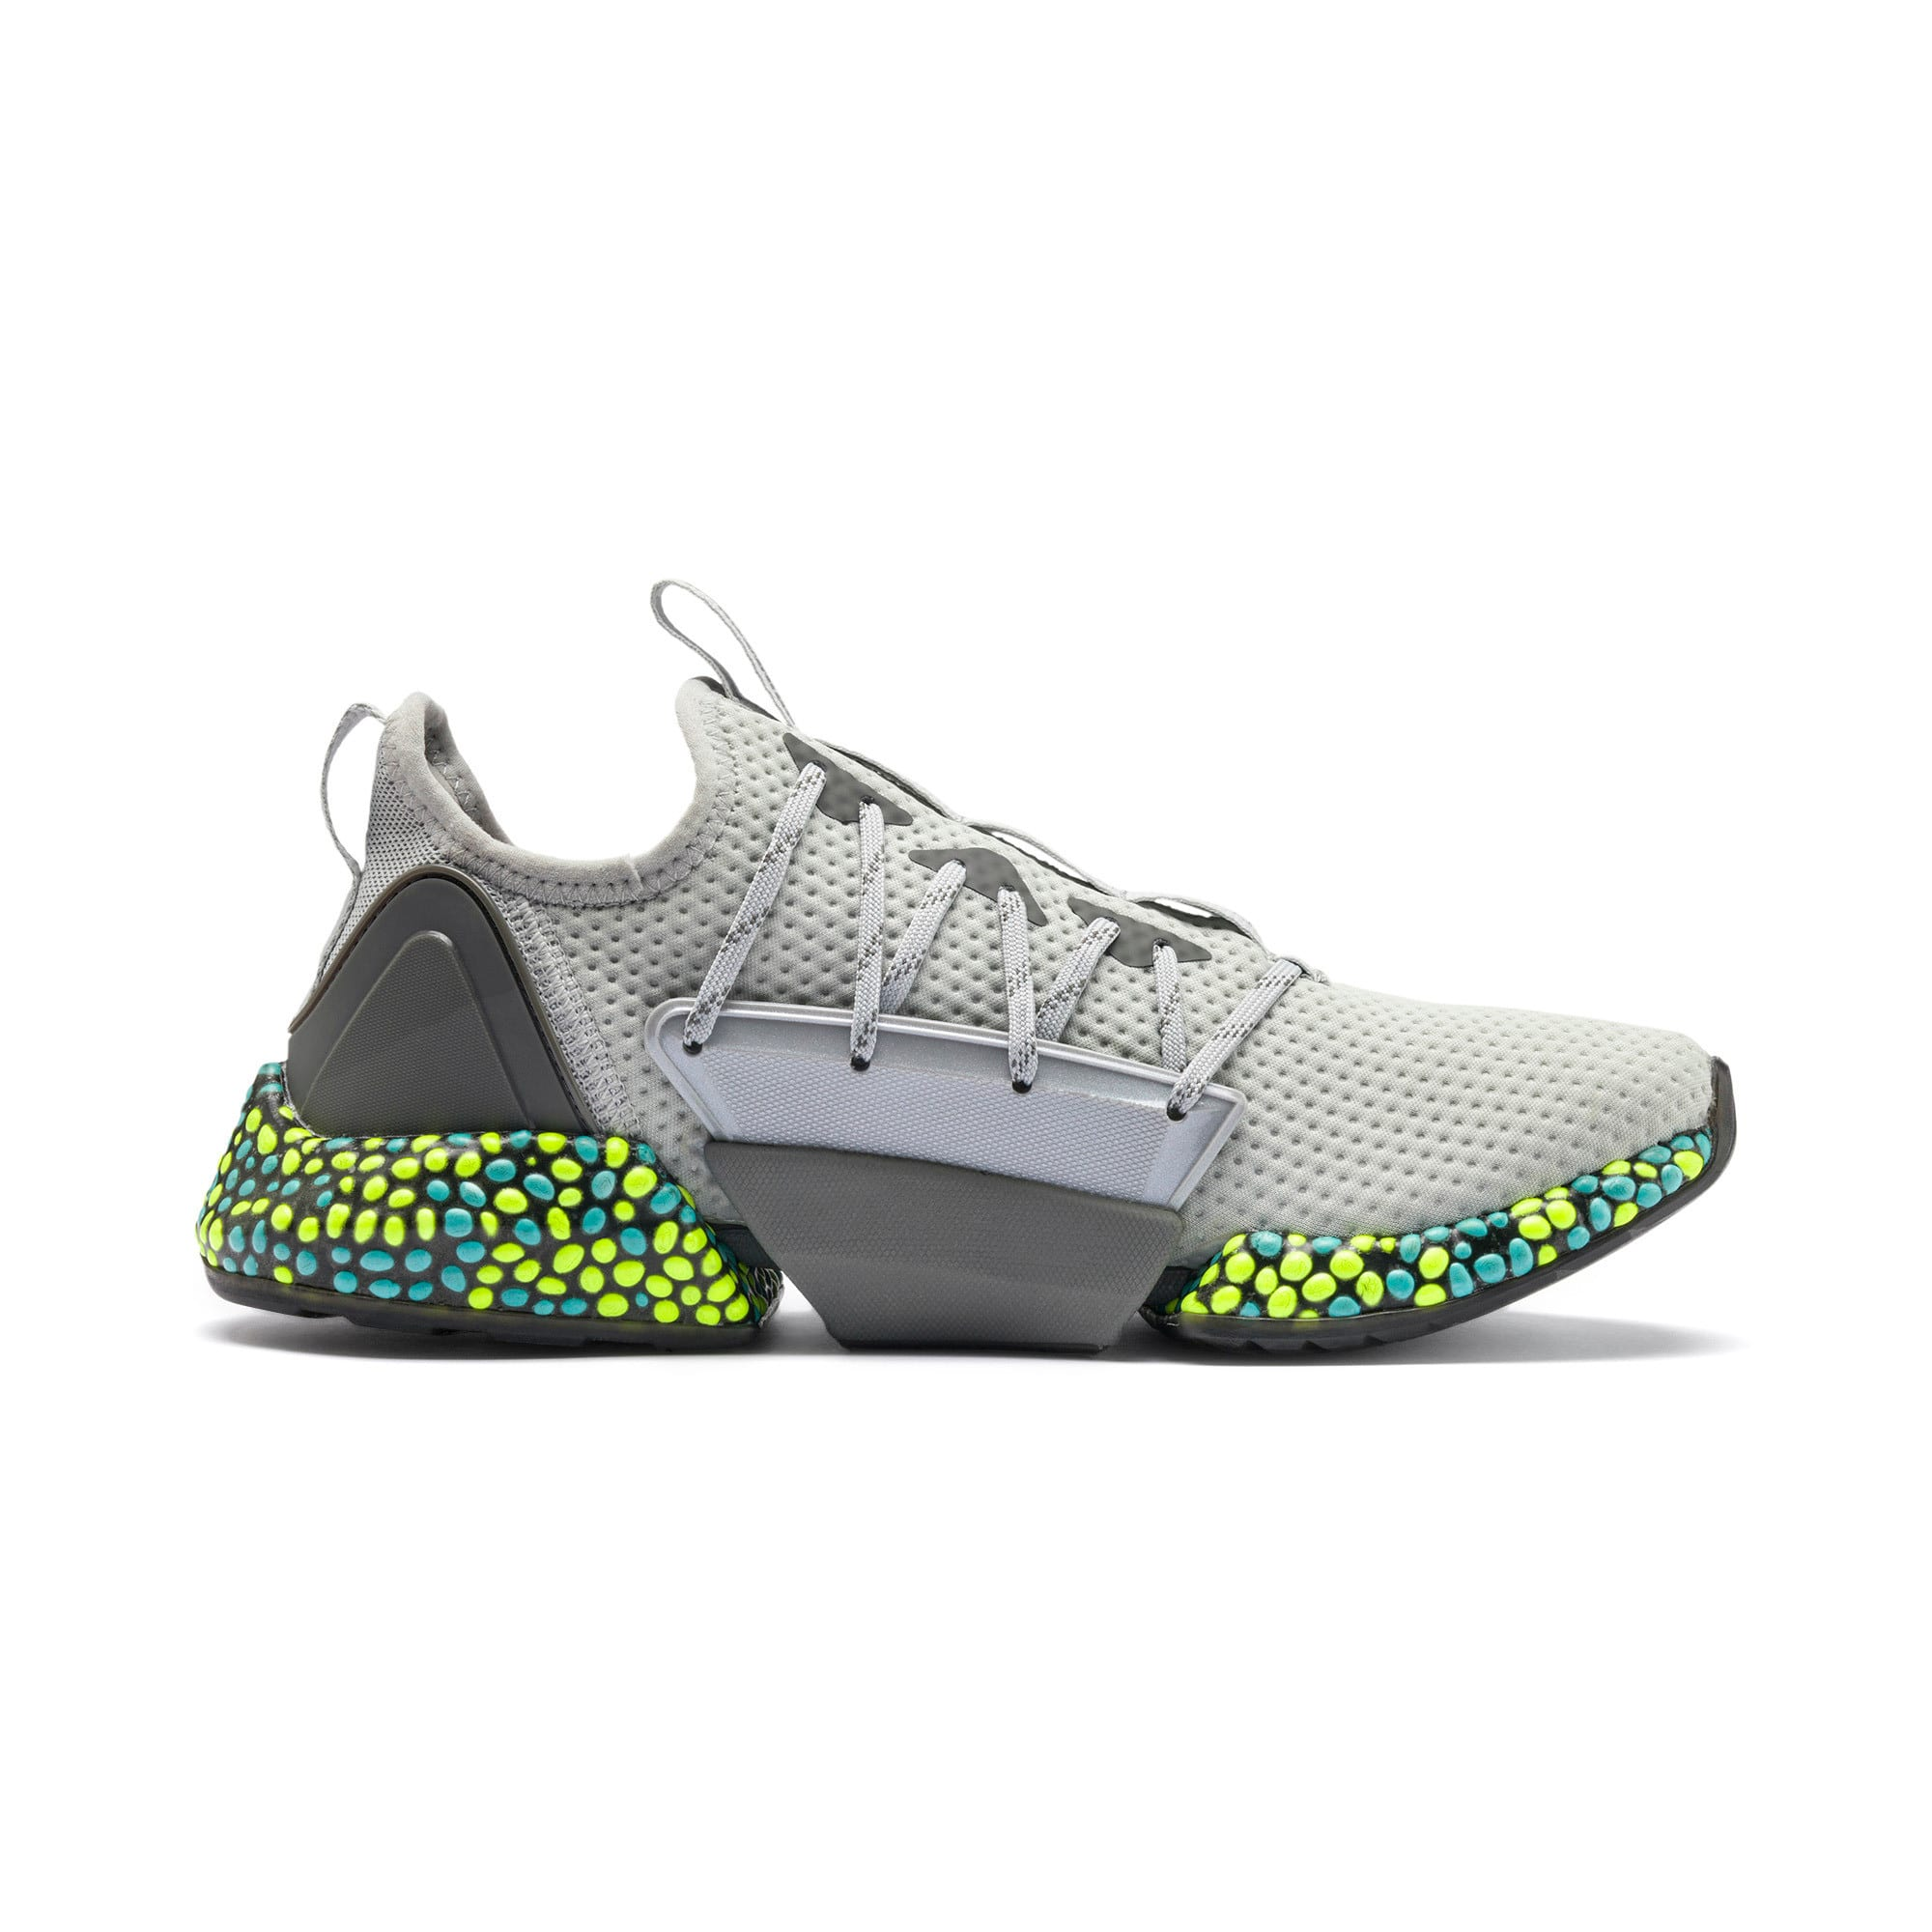 Thumbnail 6 of HYBRID Rocket Aero Men's Running Shoes, High Rise-CASTLEROCK, medium